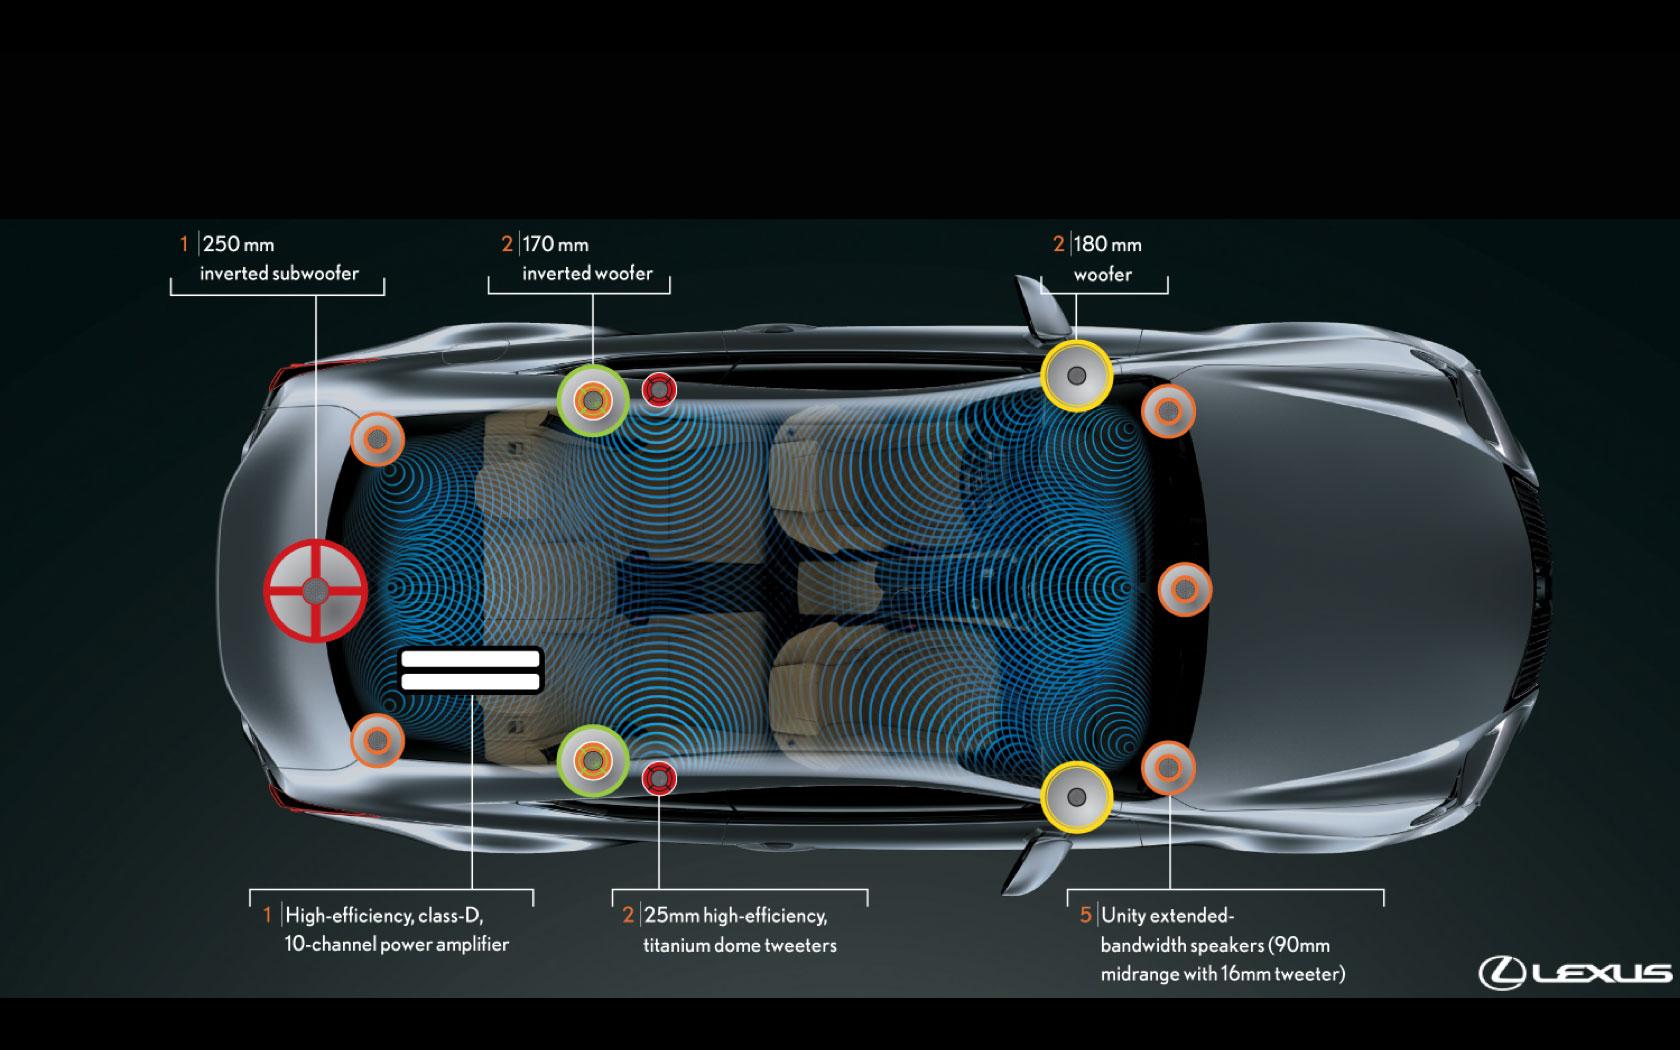 Mf 9964 Lexus Speakers Wiring Diagram Free Diagram